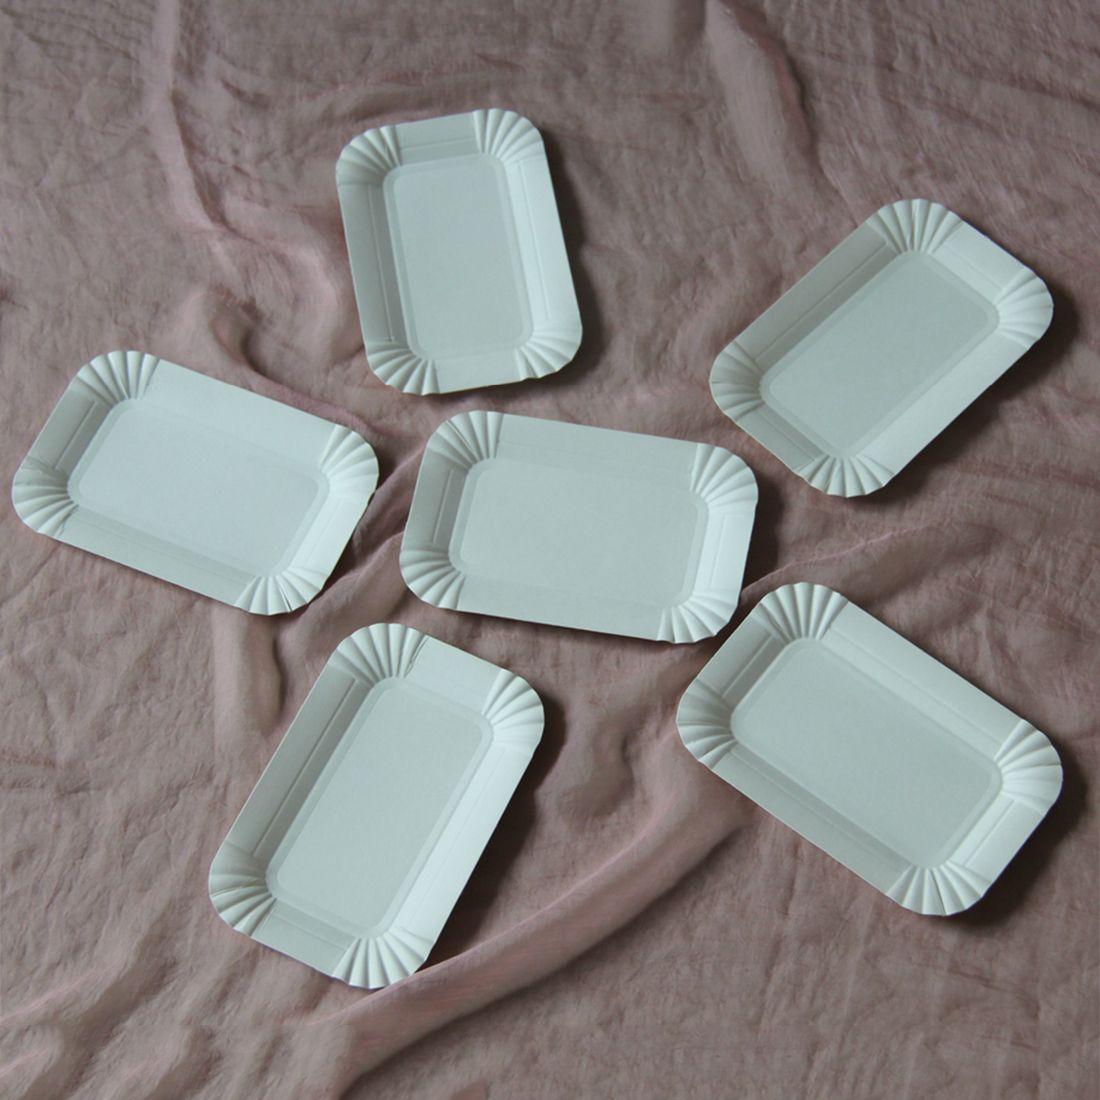 Wholesale-Hot Selling Disposable Paper Plates Rectangular Dinnerware Paper Plates Festival Wedding Party Supplies Party Supplies Wedding Party Supplies ... & Wholesale-Hot Selling Disposable Paper Plates Rectangular Dinnerware ...